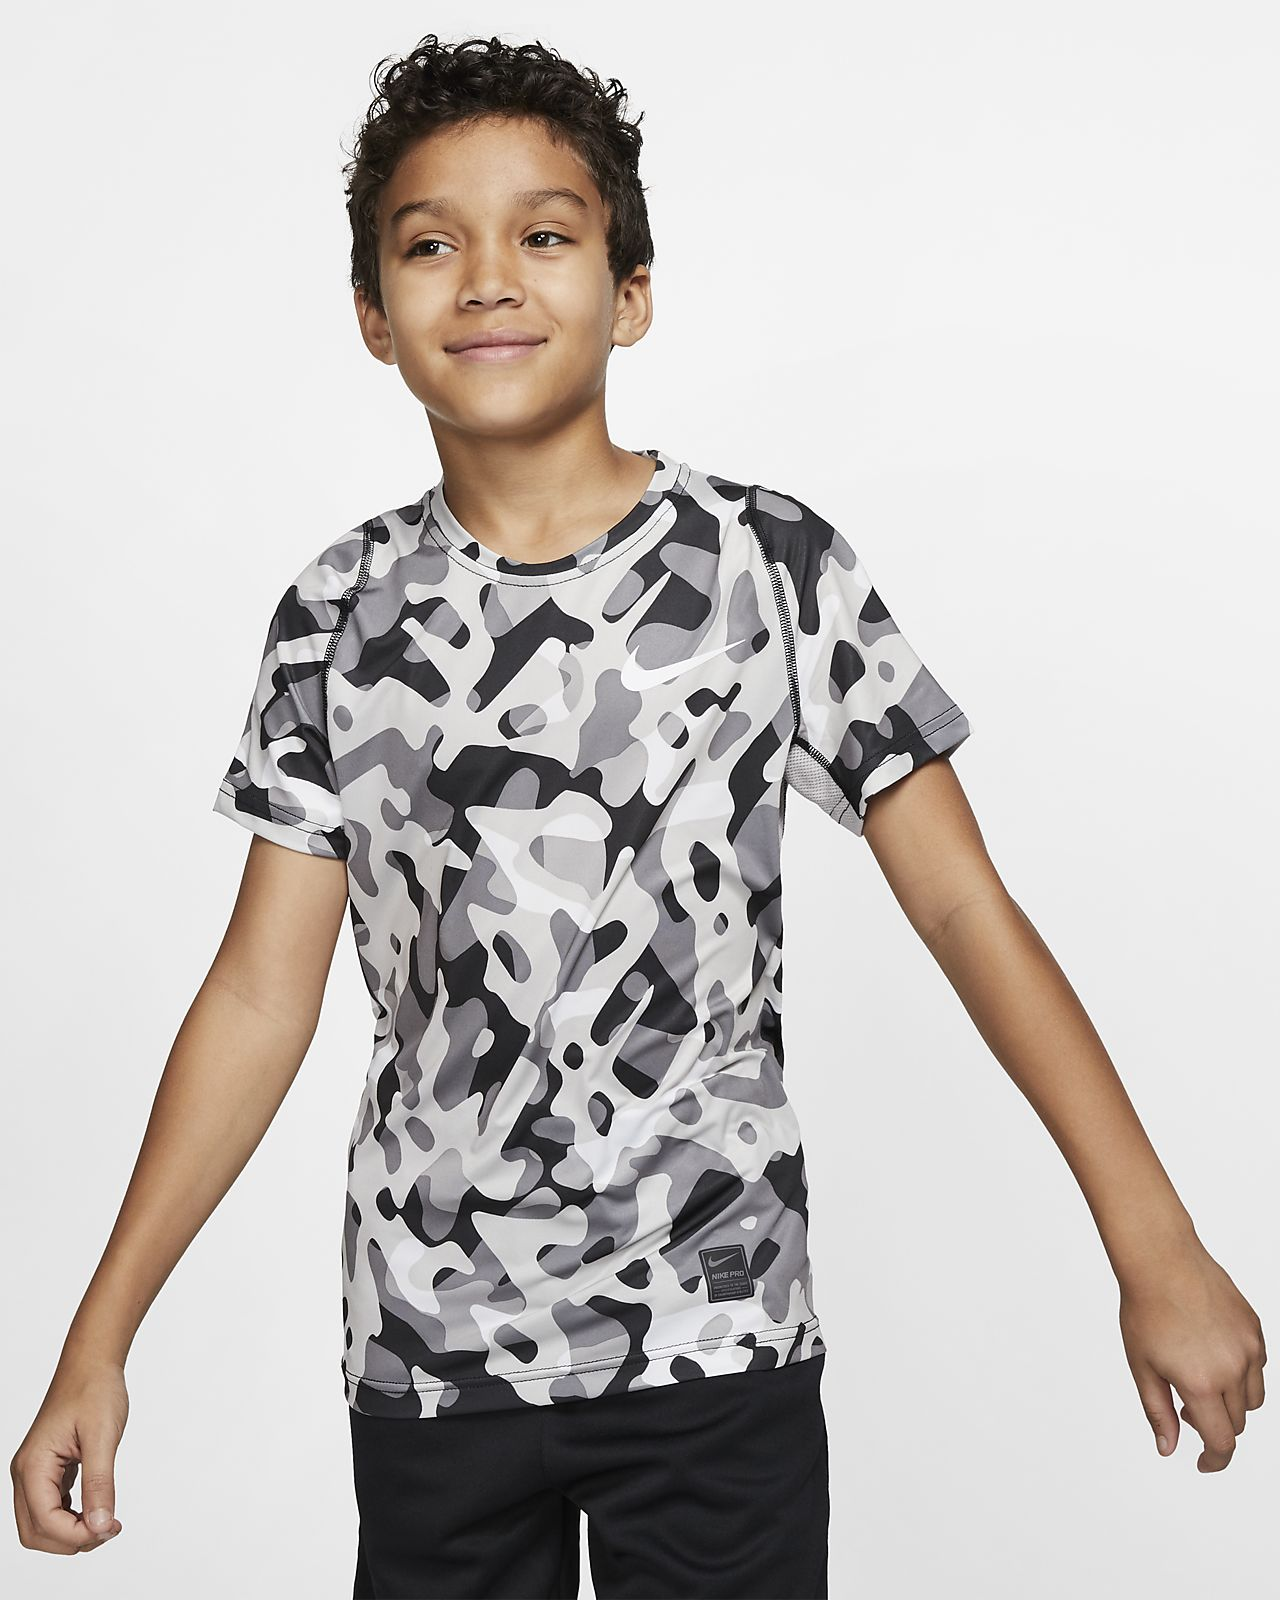 Nike Pro Boys' Short-Sleeve Printed Top